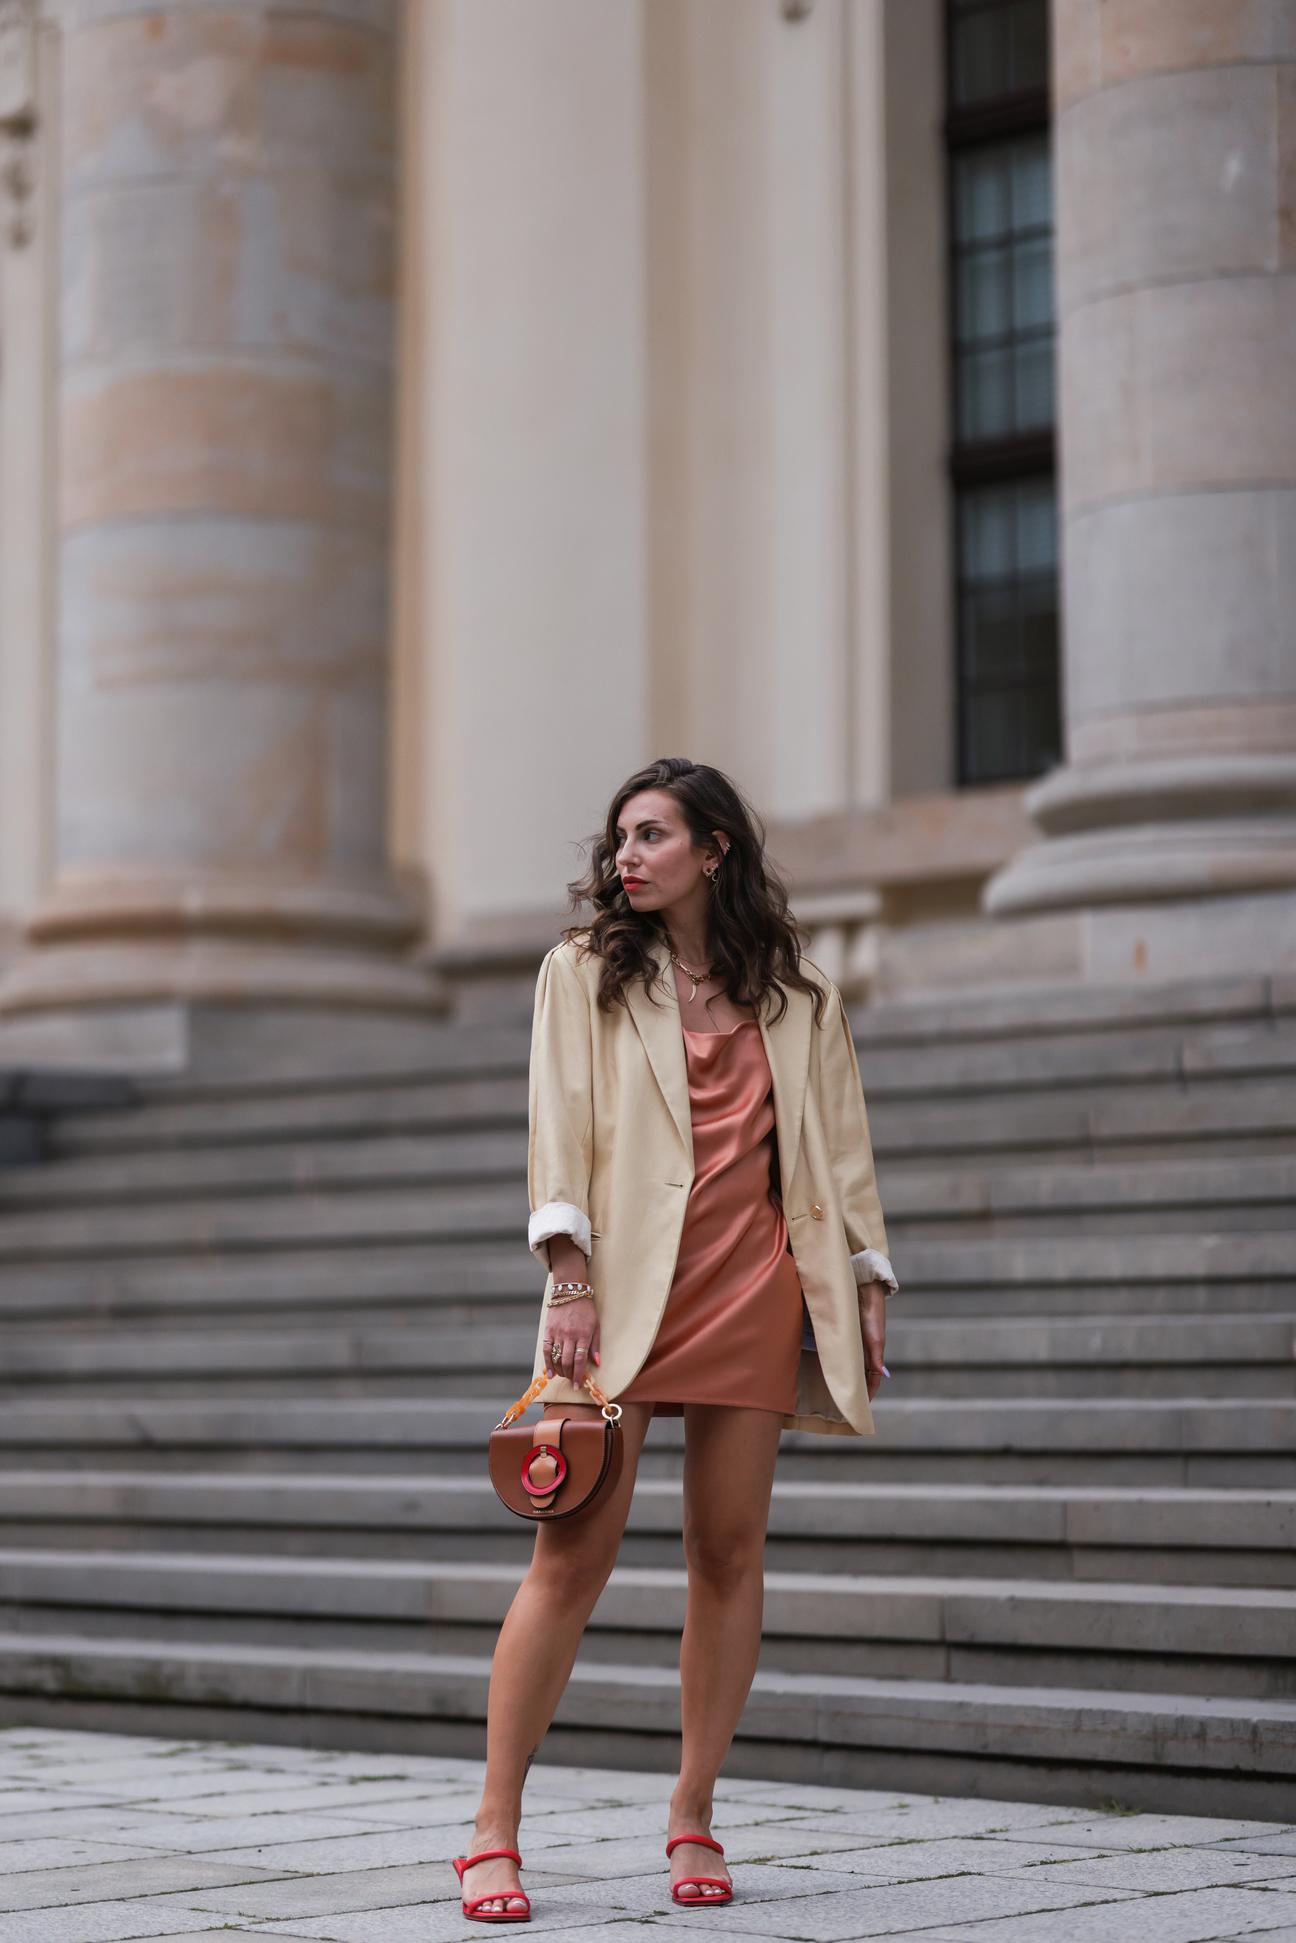 Vestido lencero con blazer